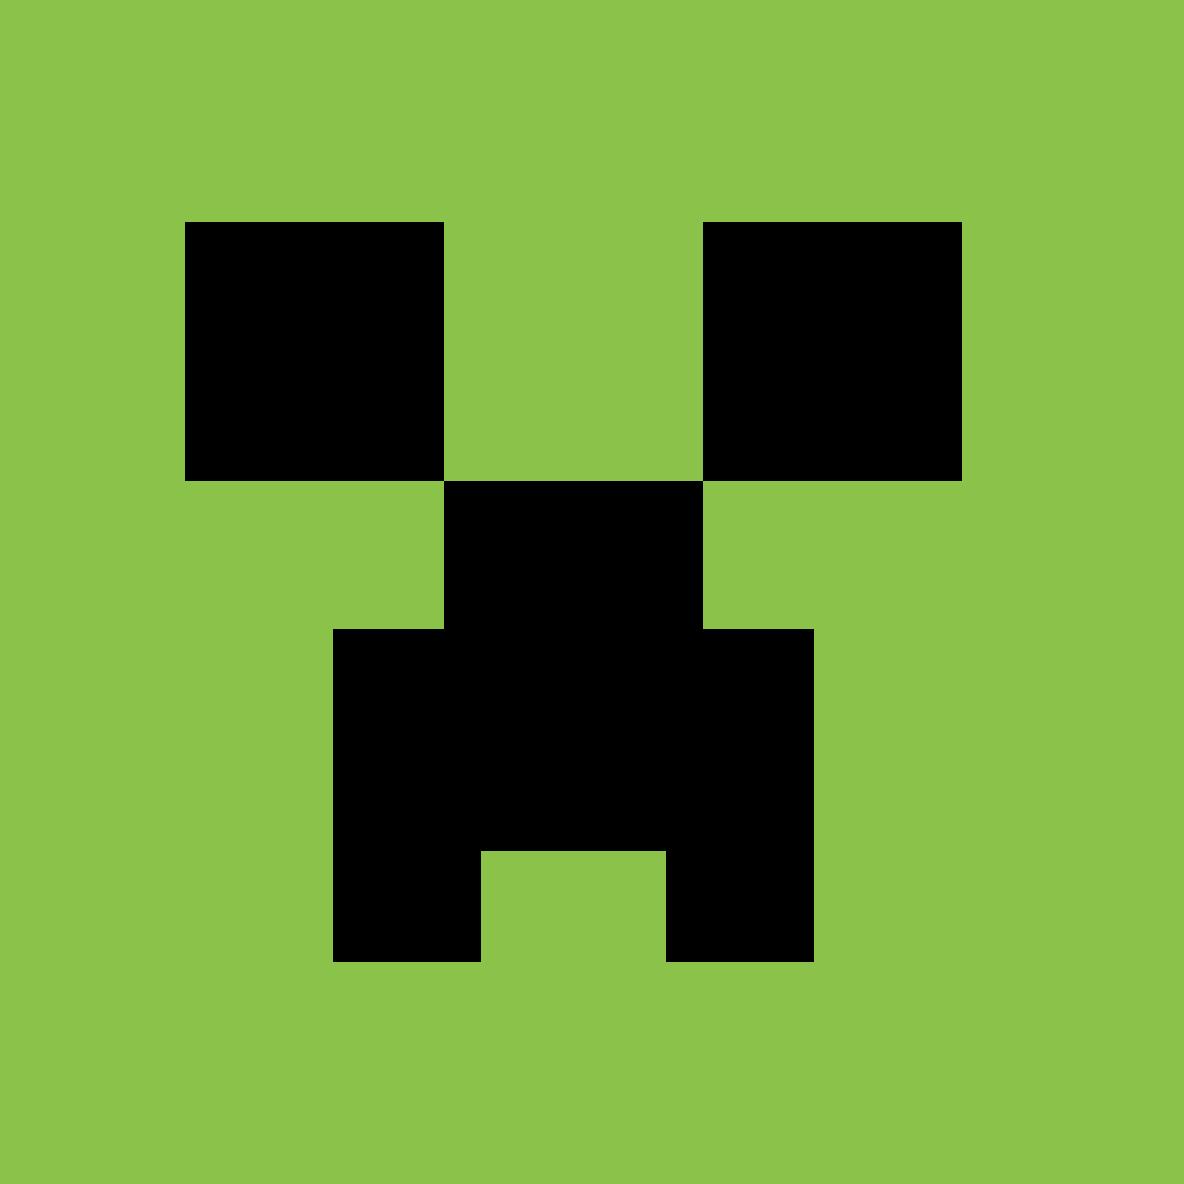 Minecarft Contest - Contest